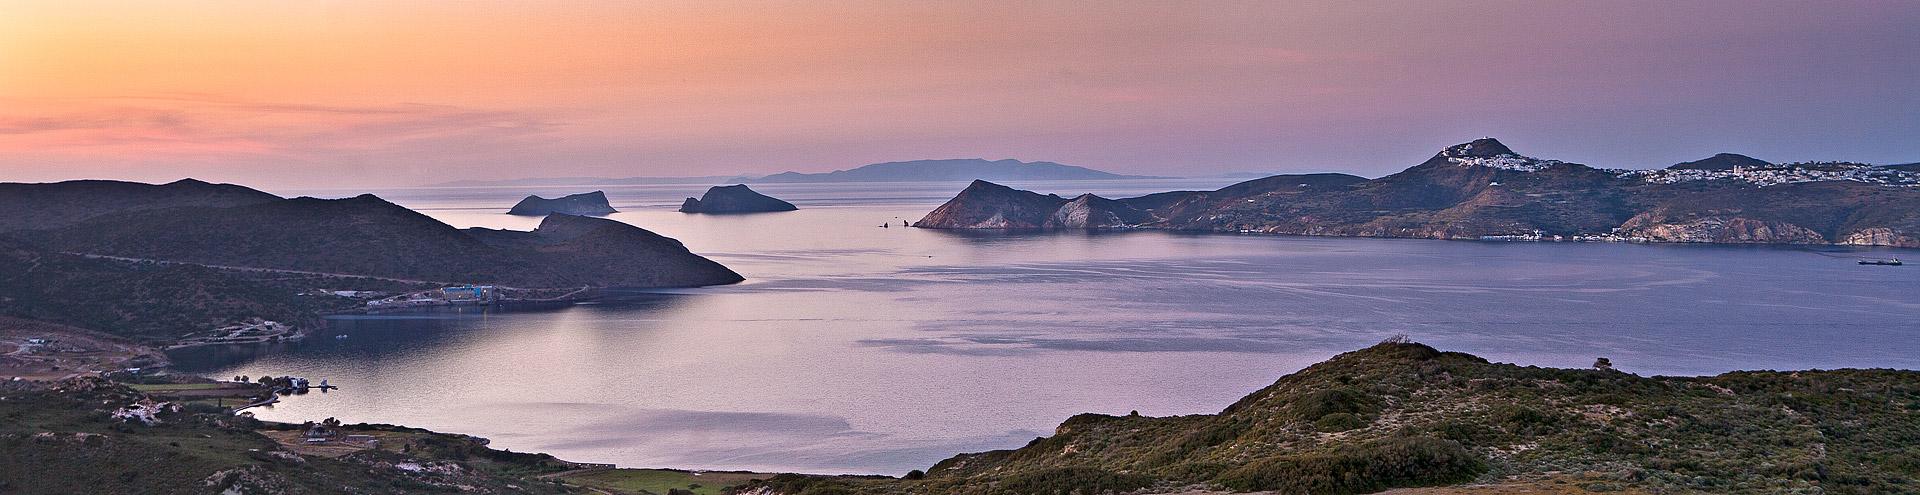 Athen, Laurion und Insel Milos